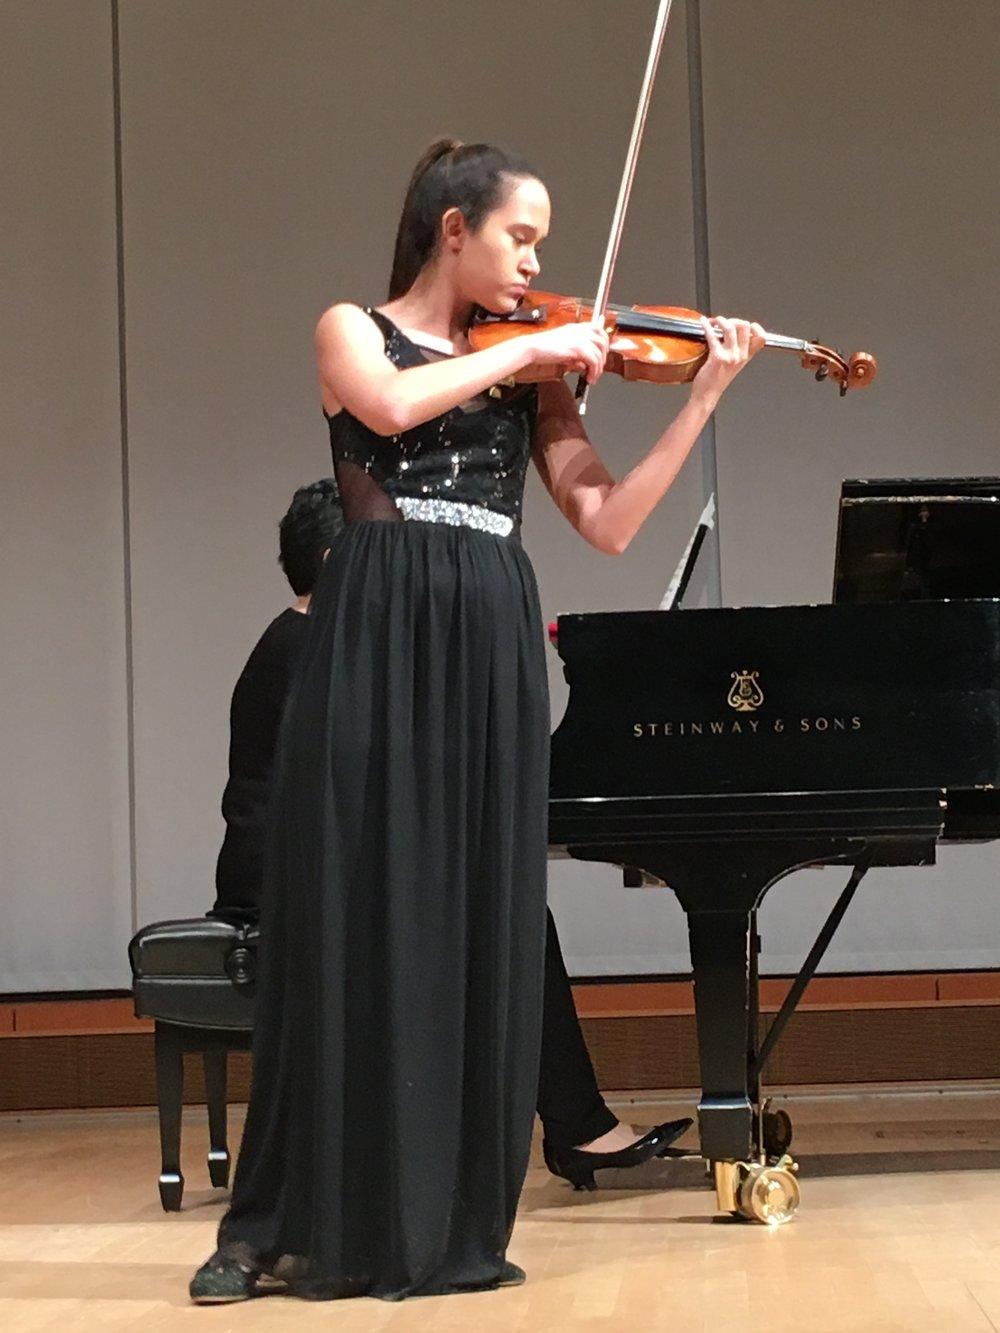 Sofia Schutte